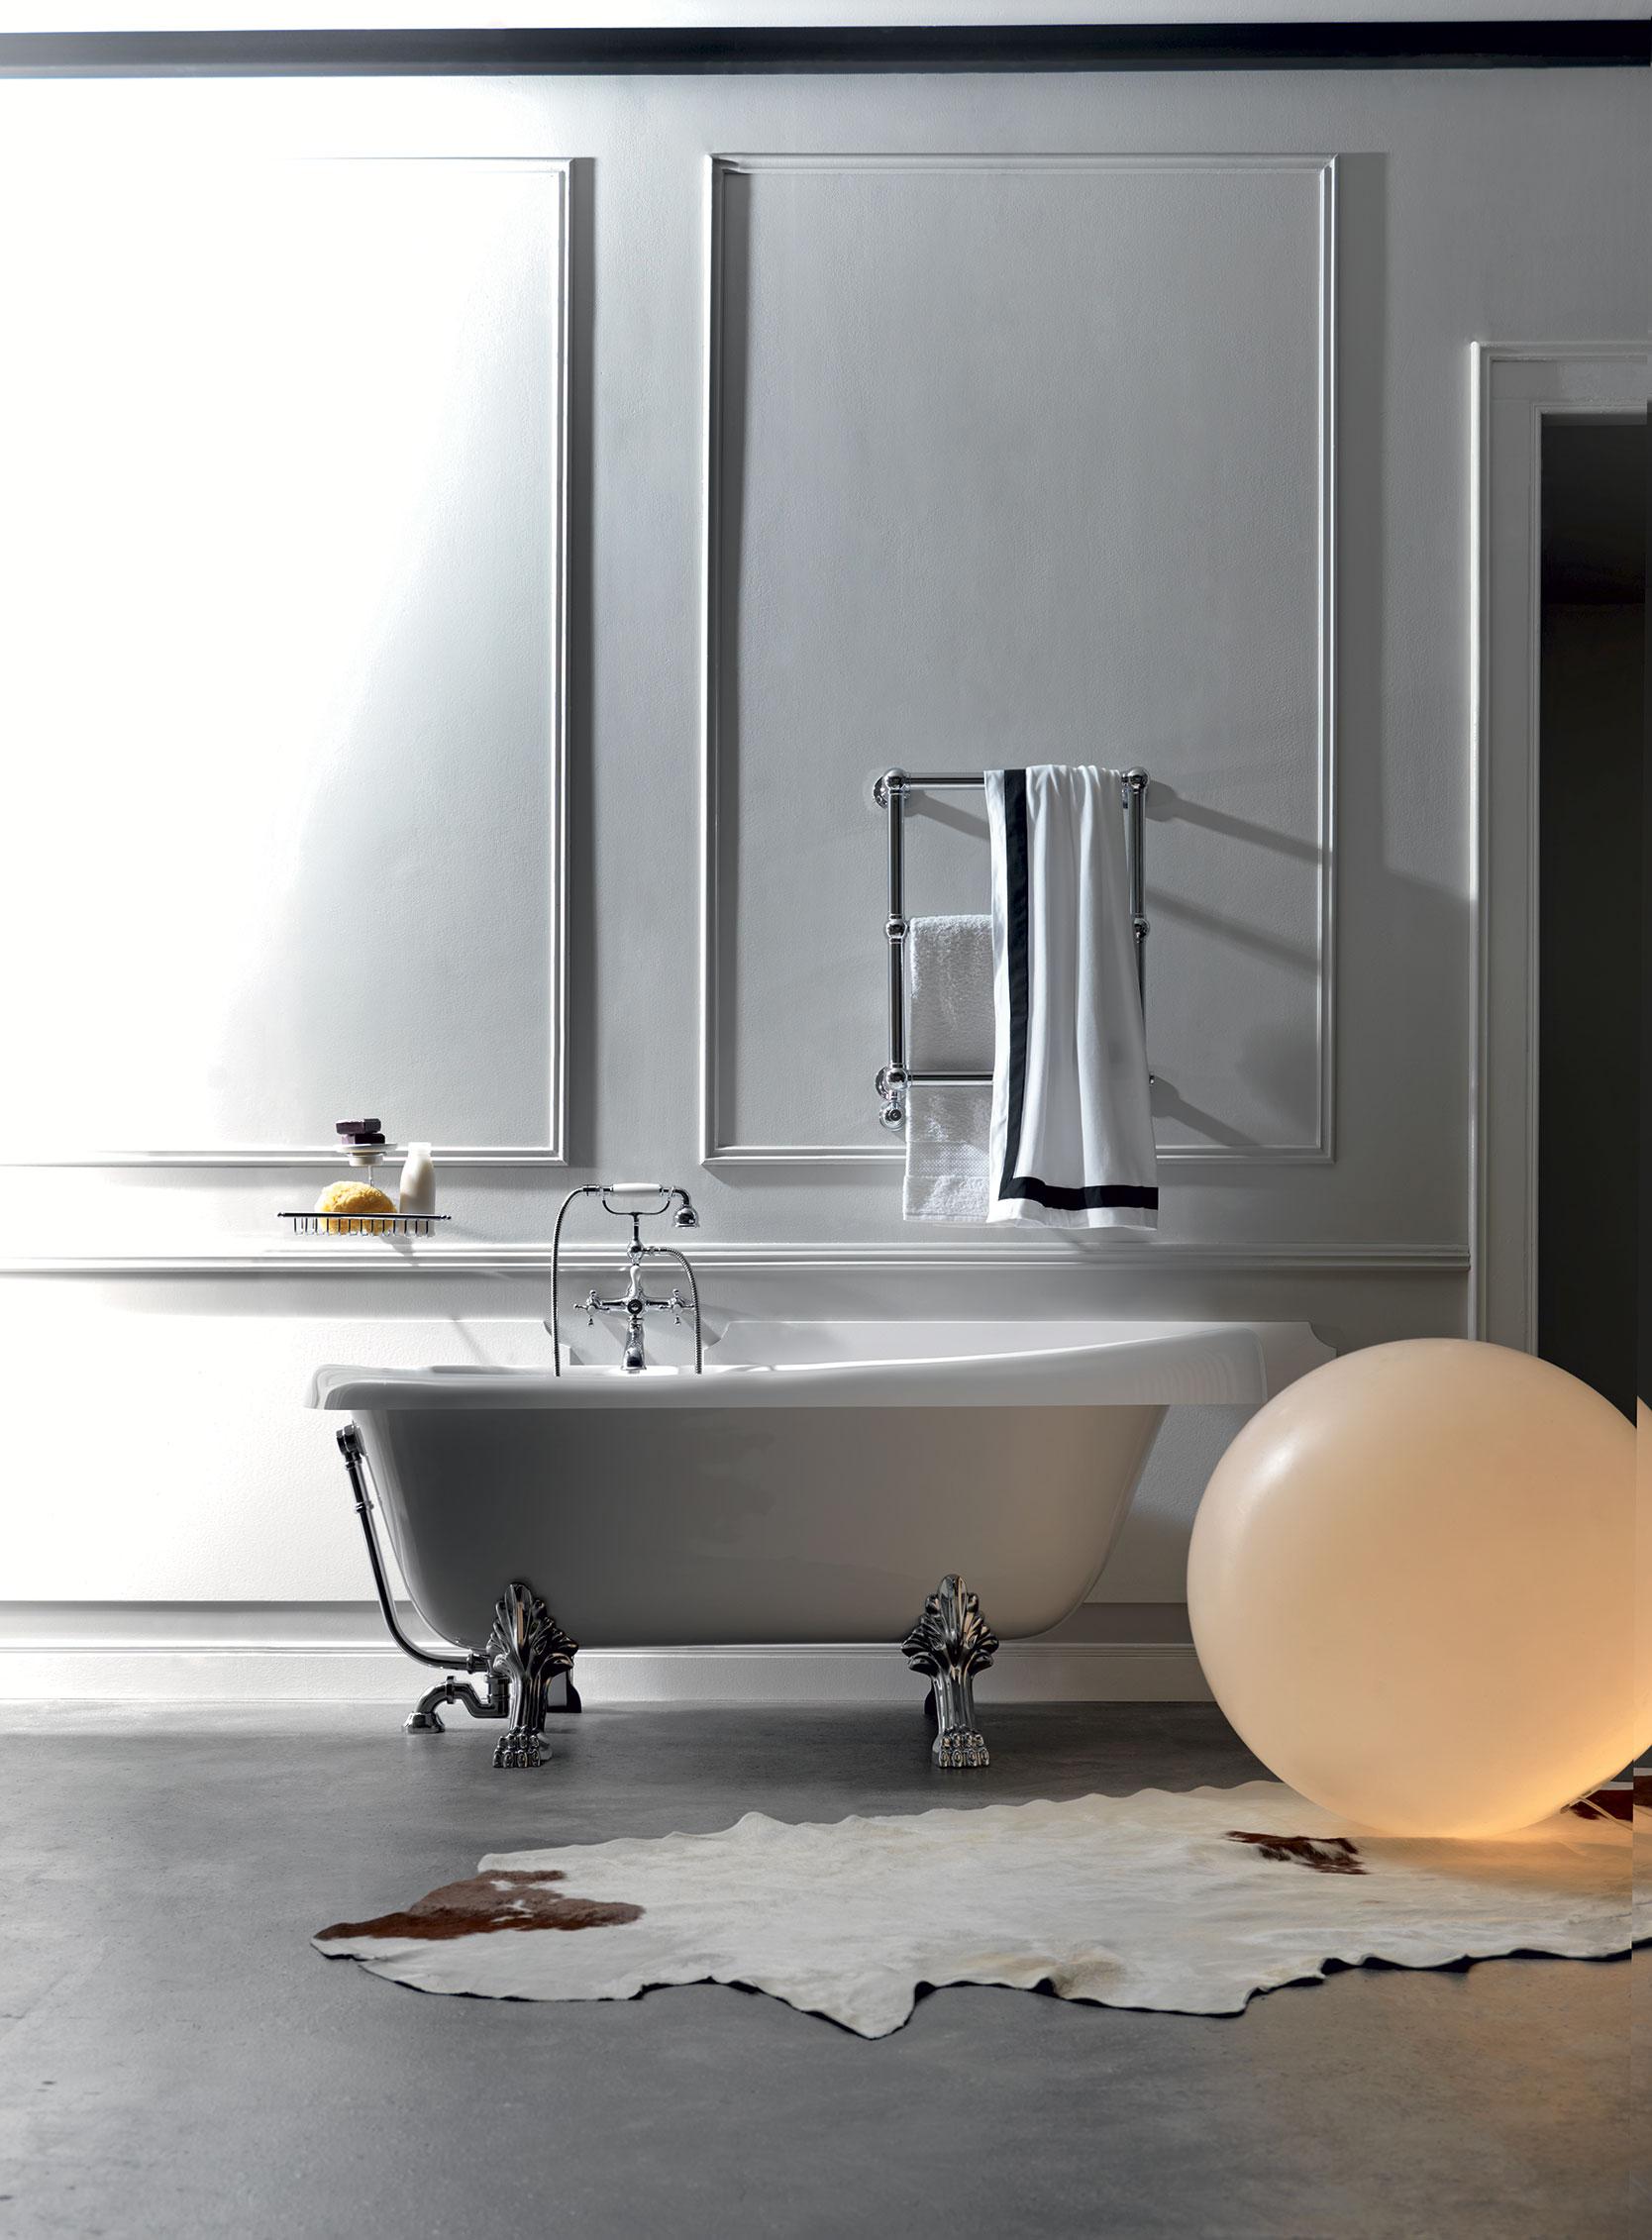 Vasca da bagno bianca - Installare una vasca da bagno ...